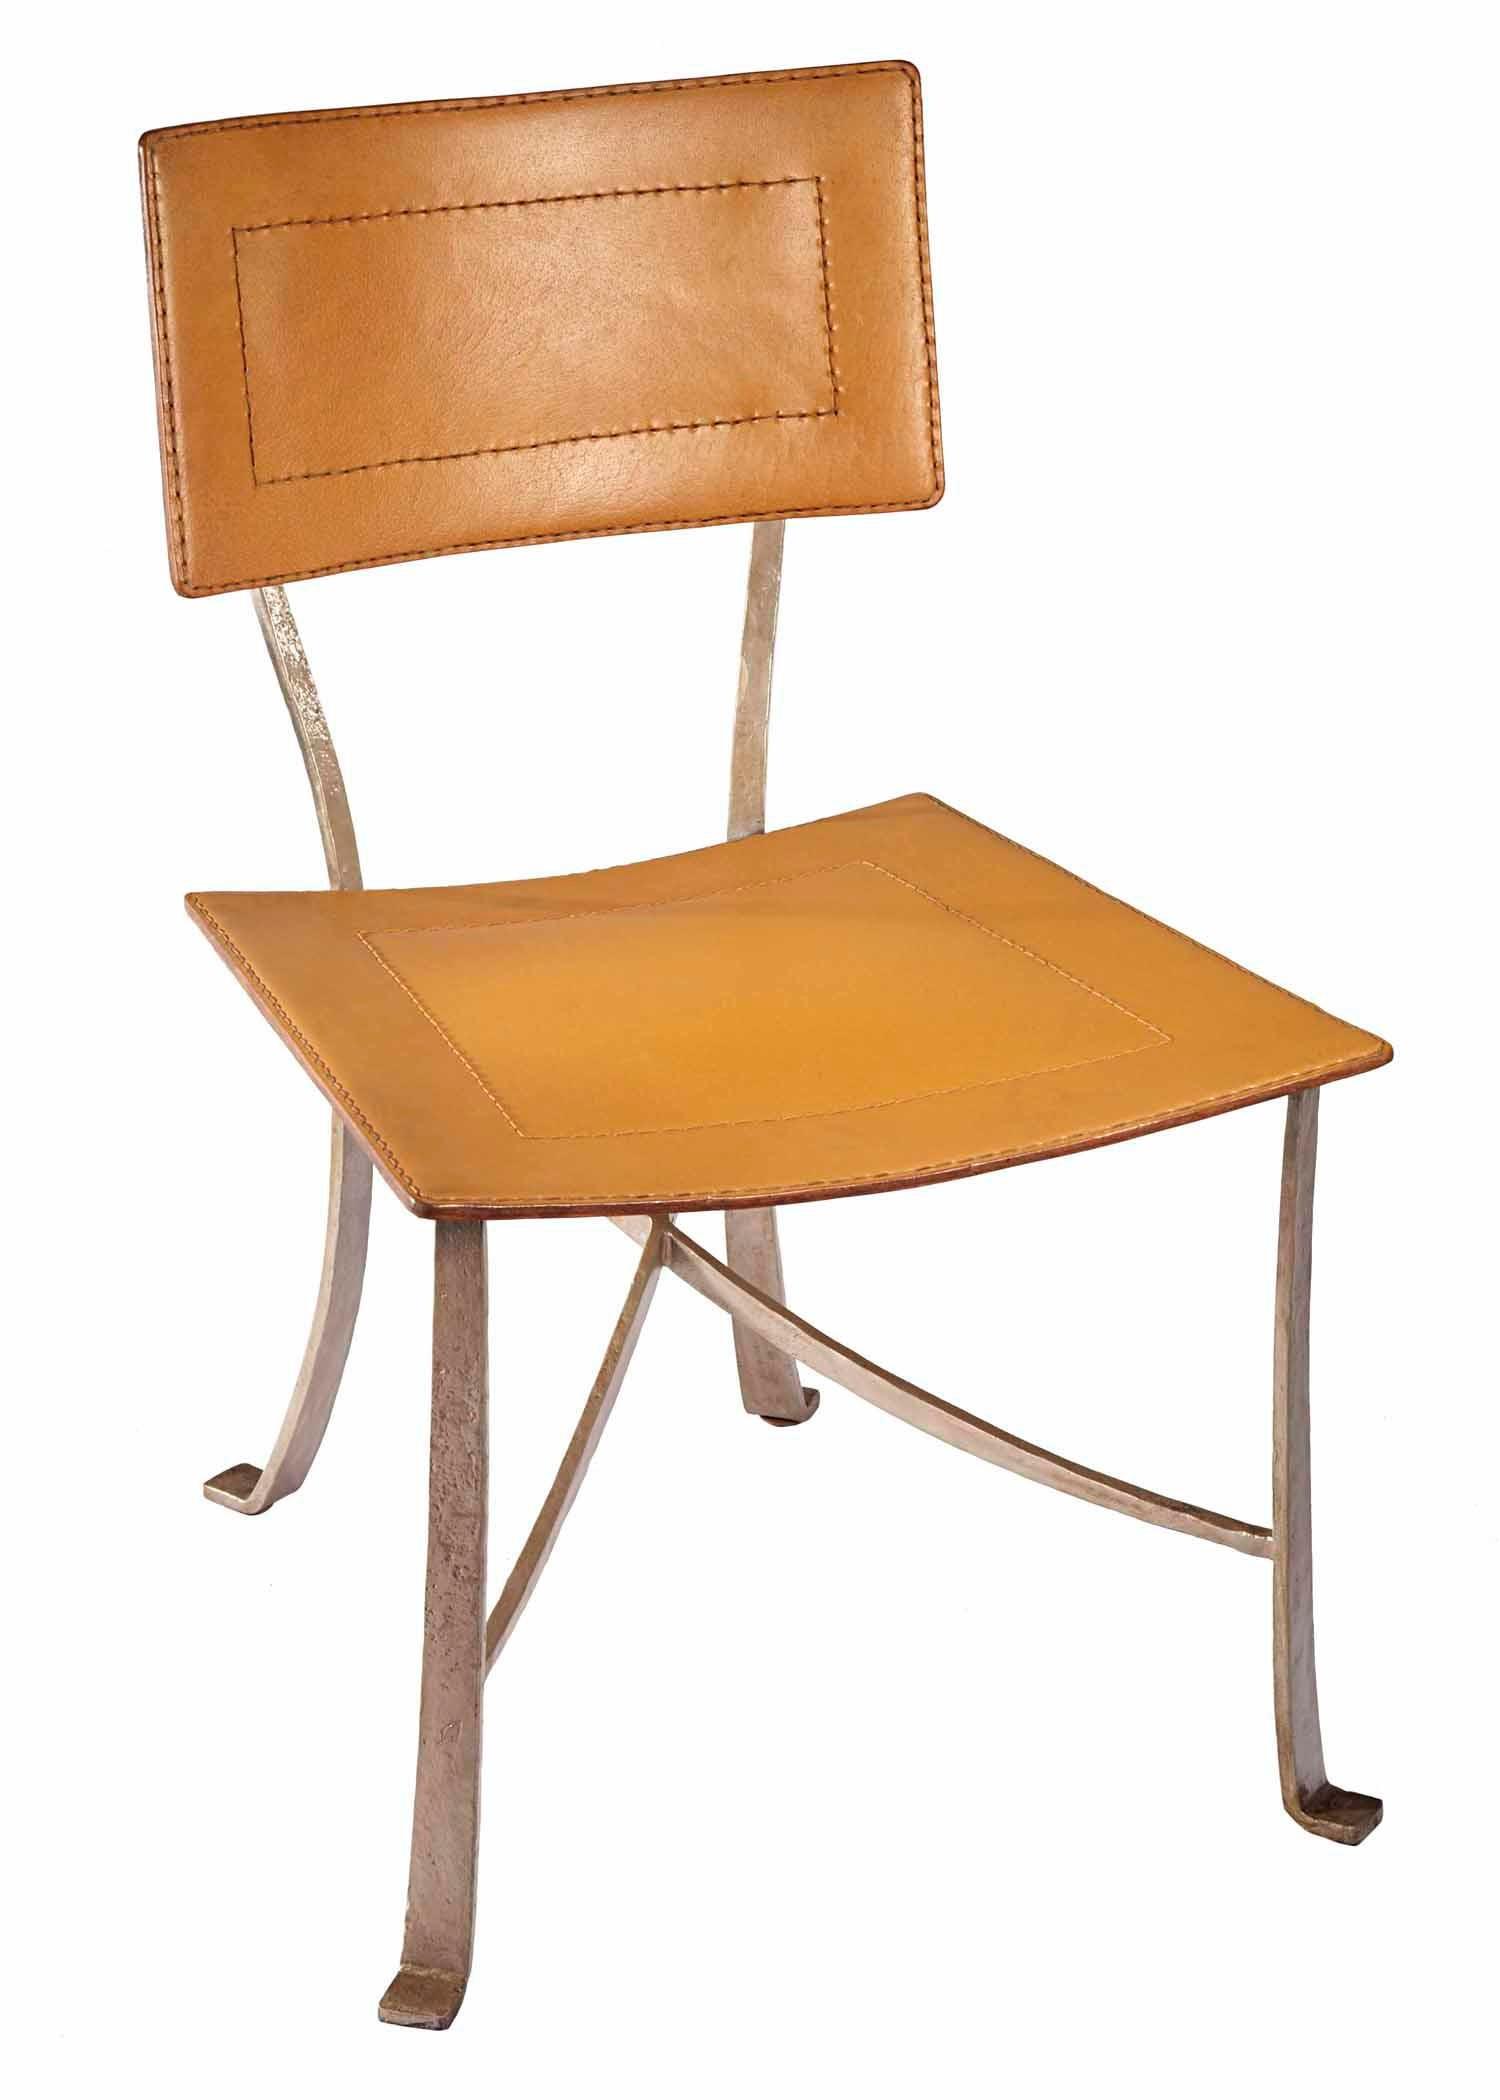 chair design iron super comfy selamat designs klismos silver wrought dining